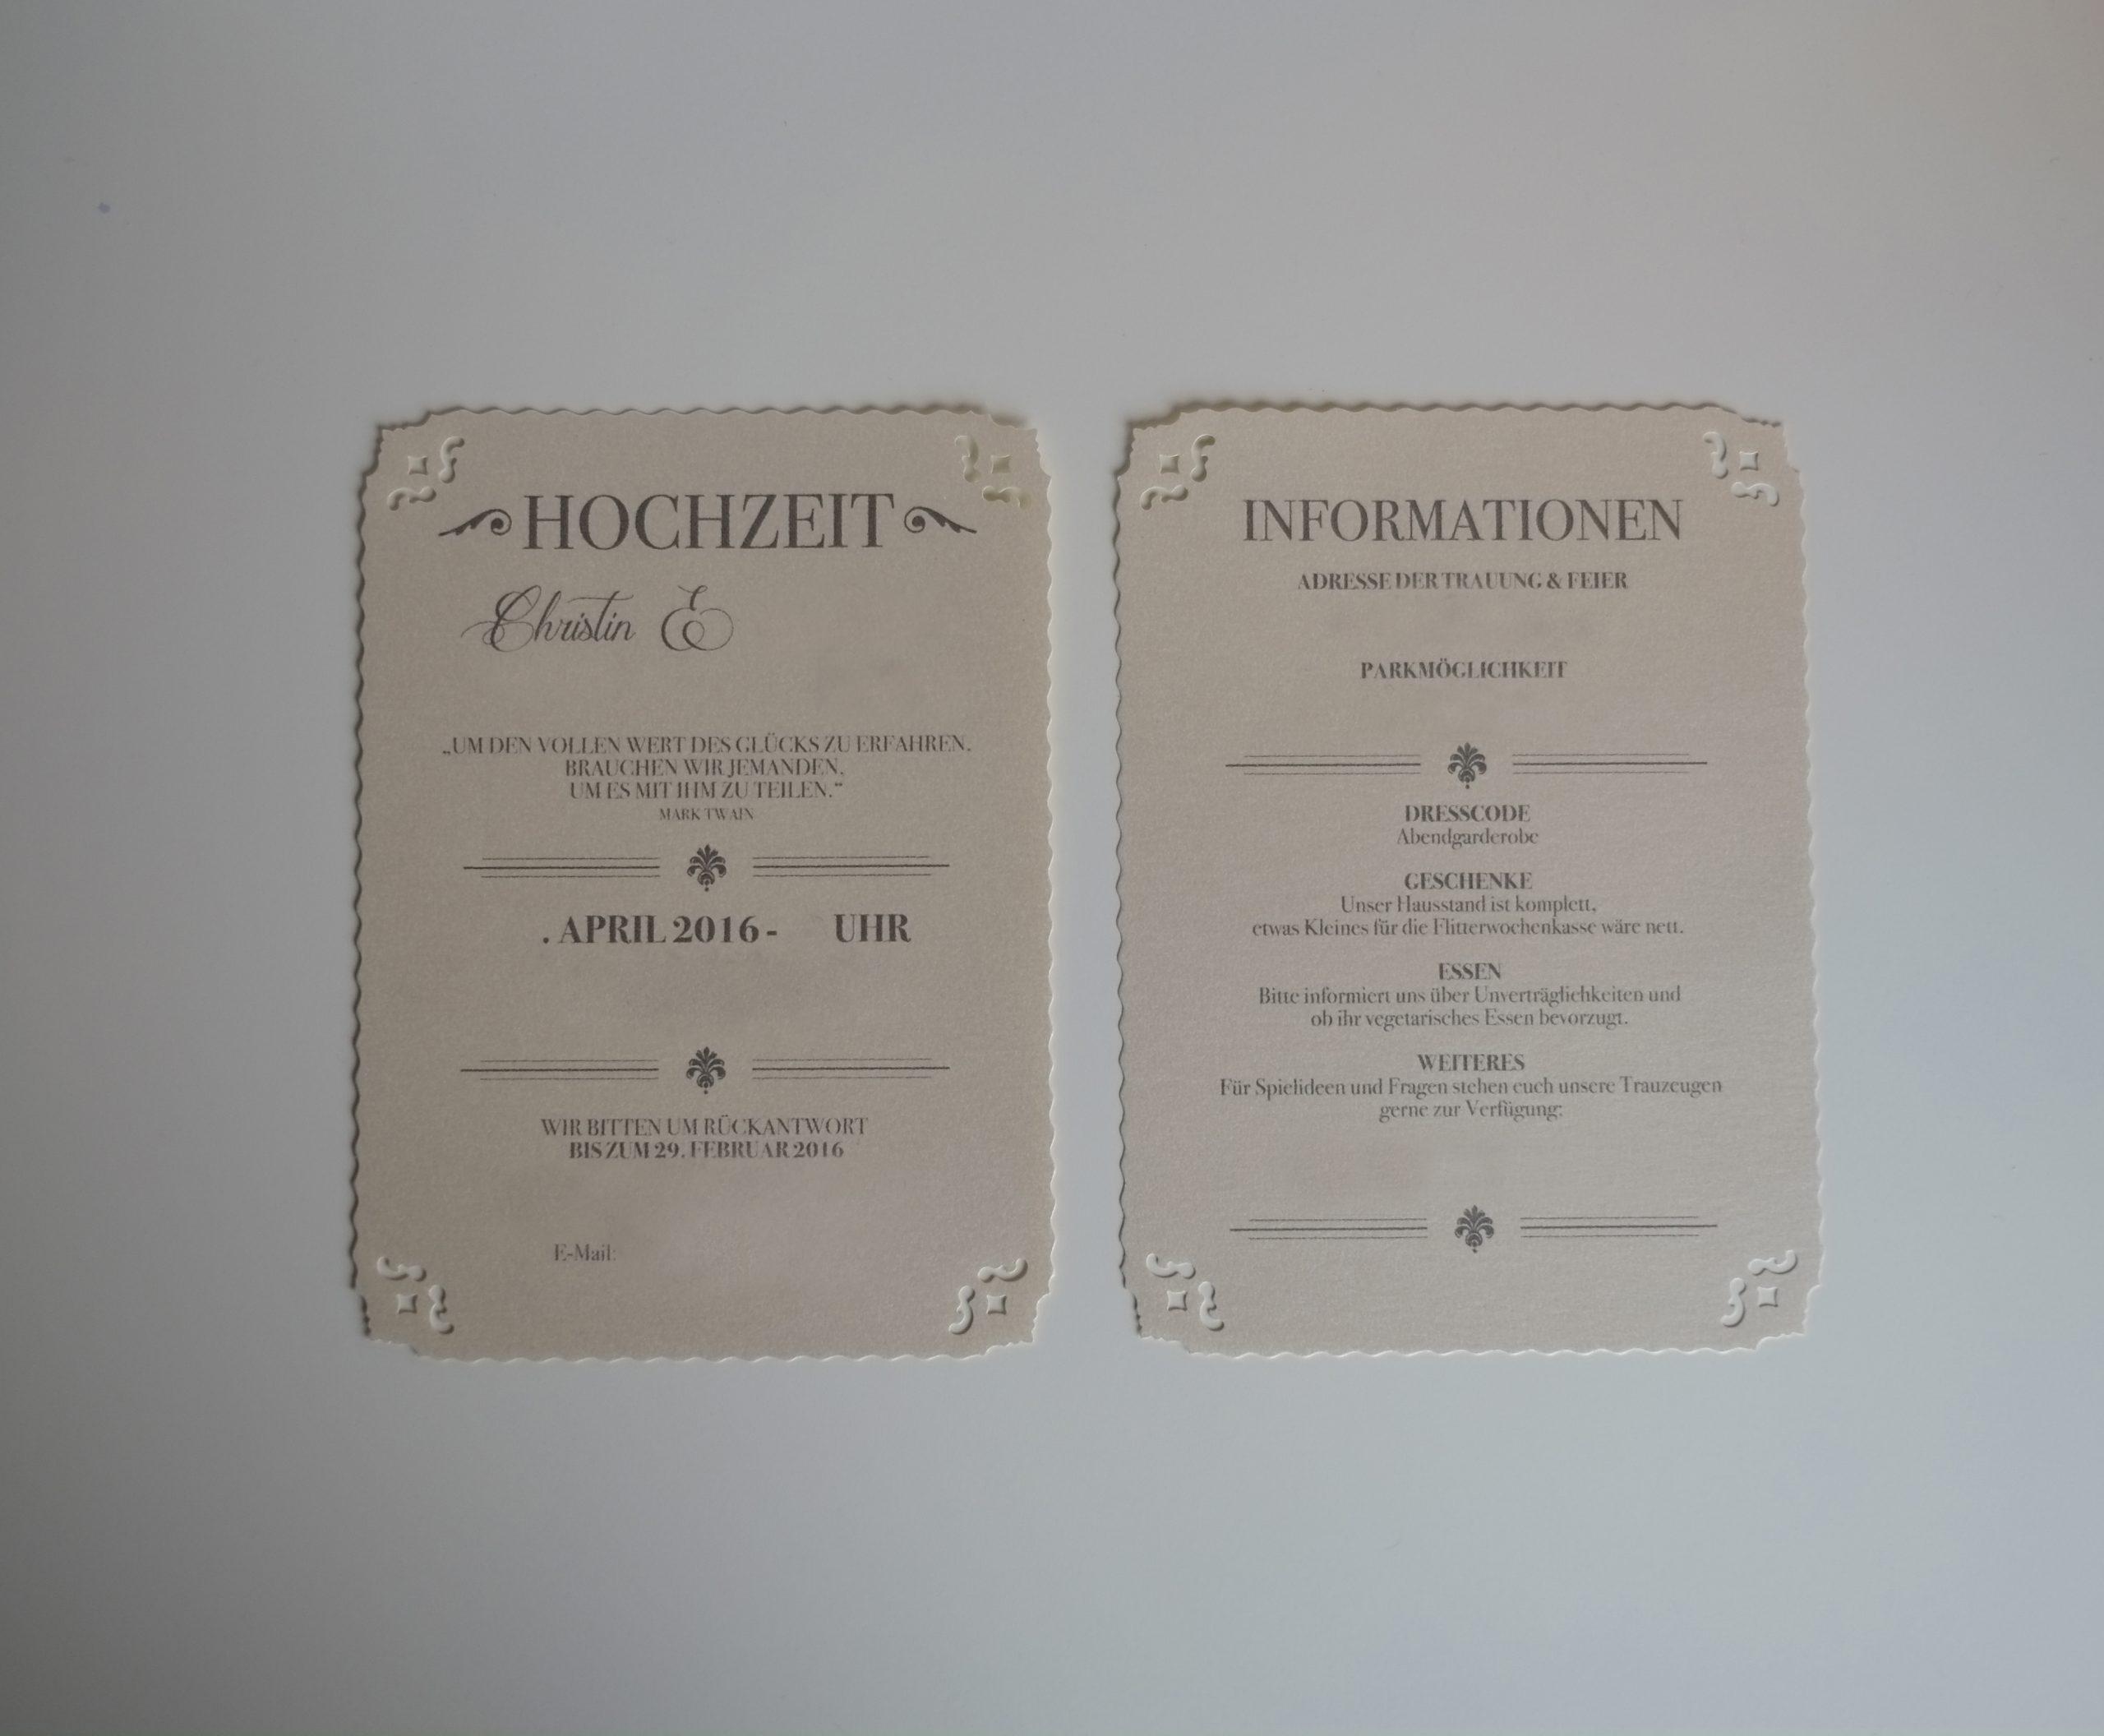 Vintage Hochzeitseinladung Diy - Vintaliciously Vintage Blog